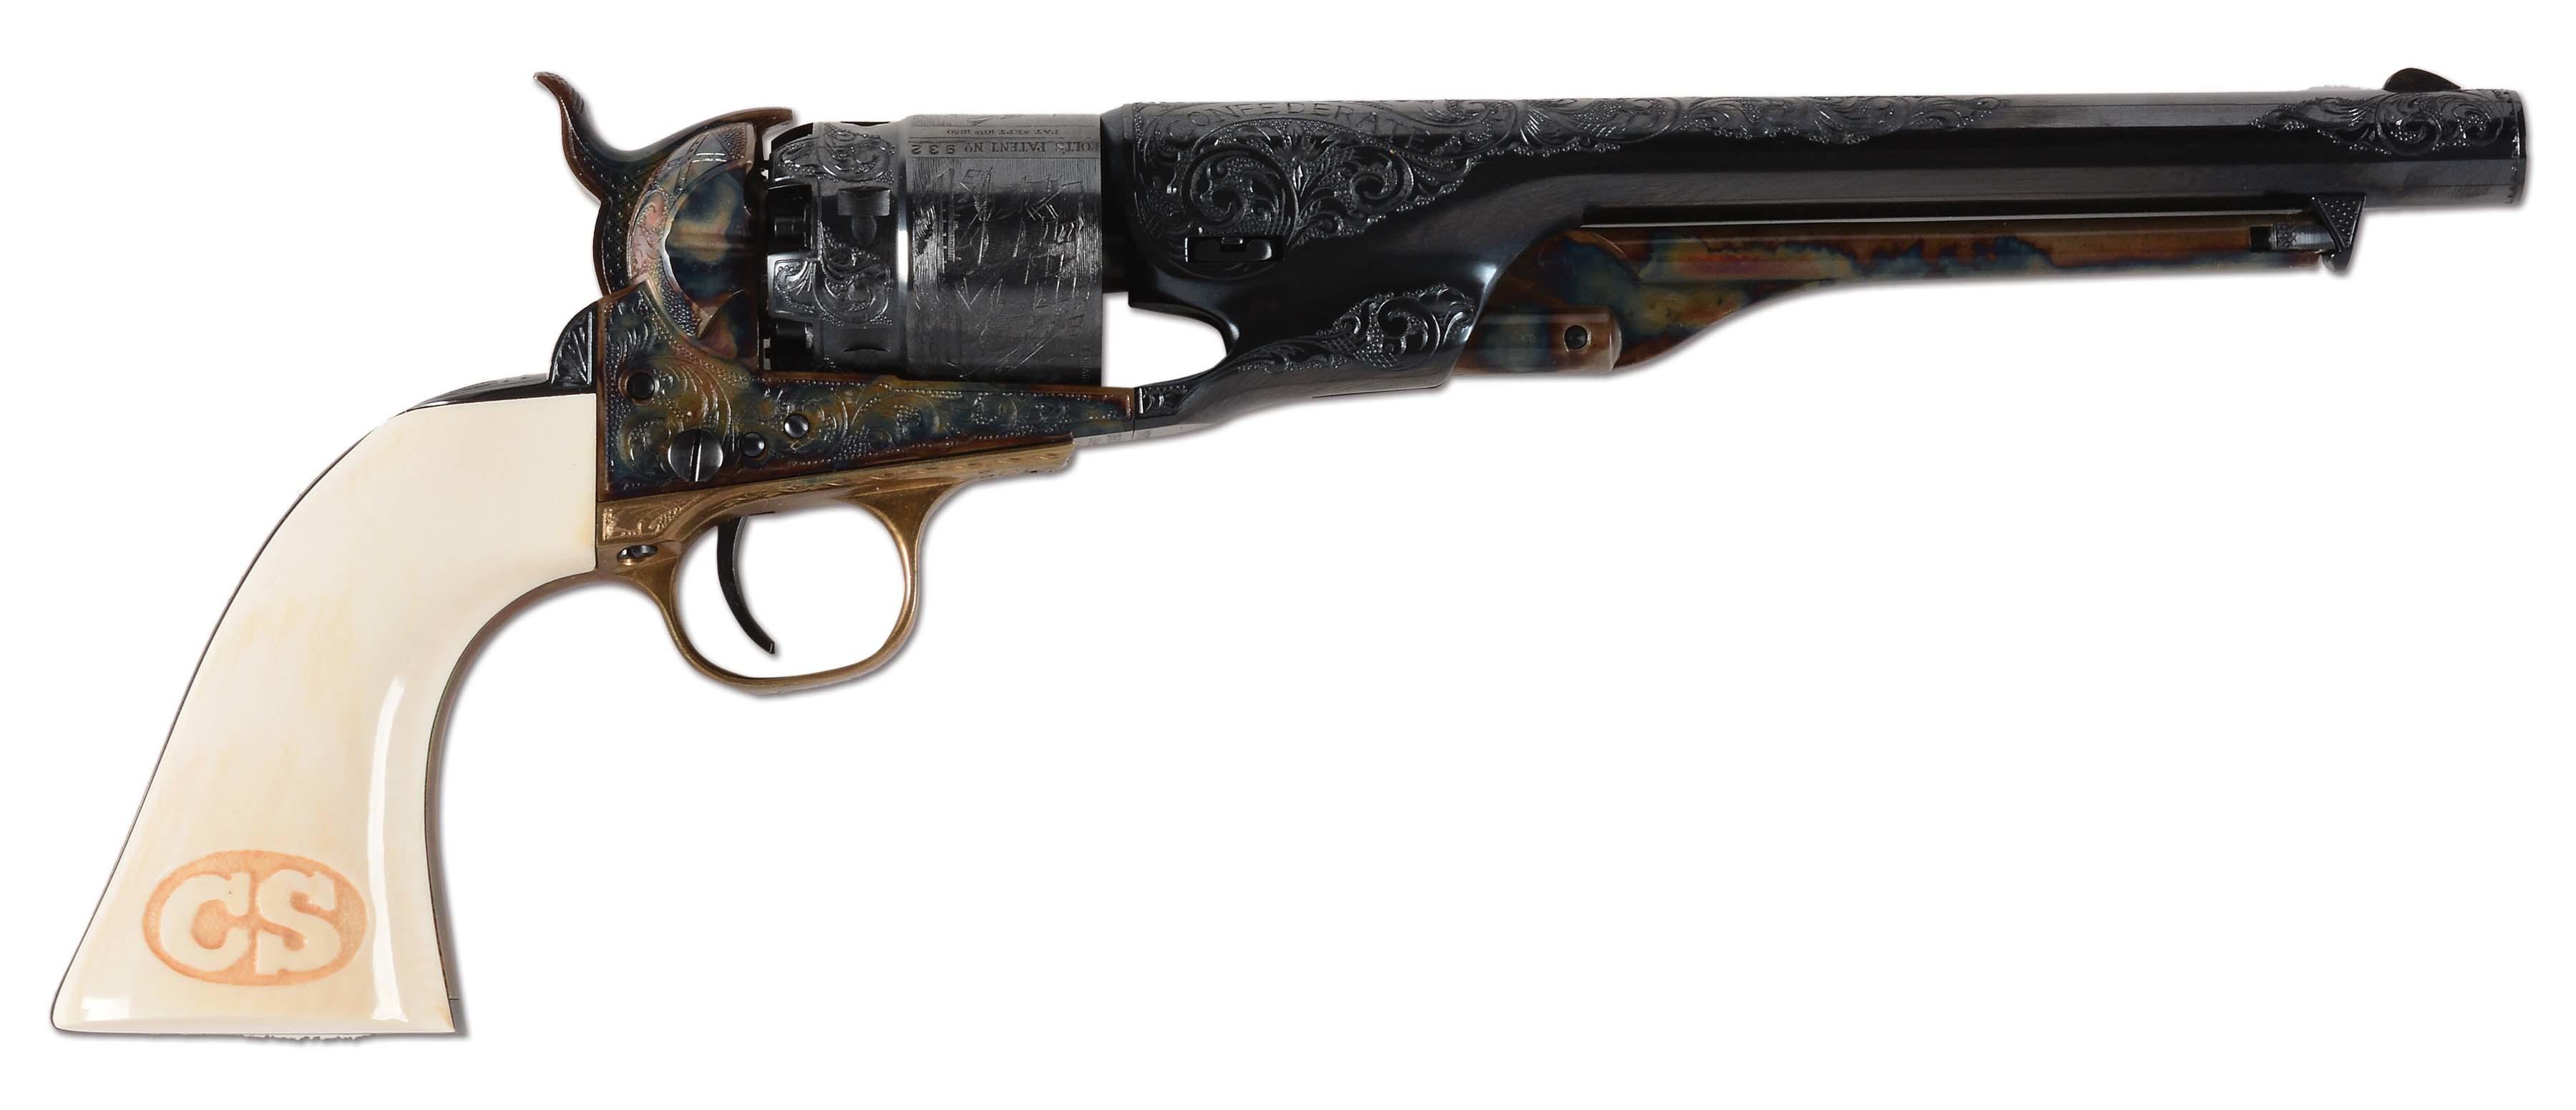 Colt Modell 1860 Army Civil War 150th Anniversary Revolver